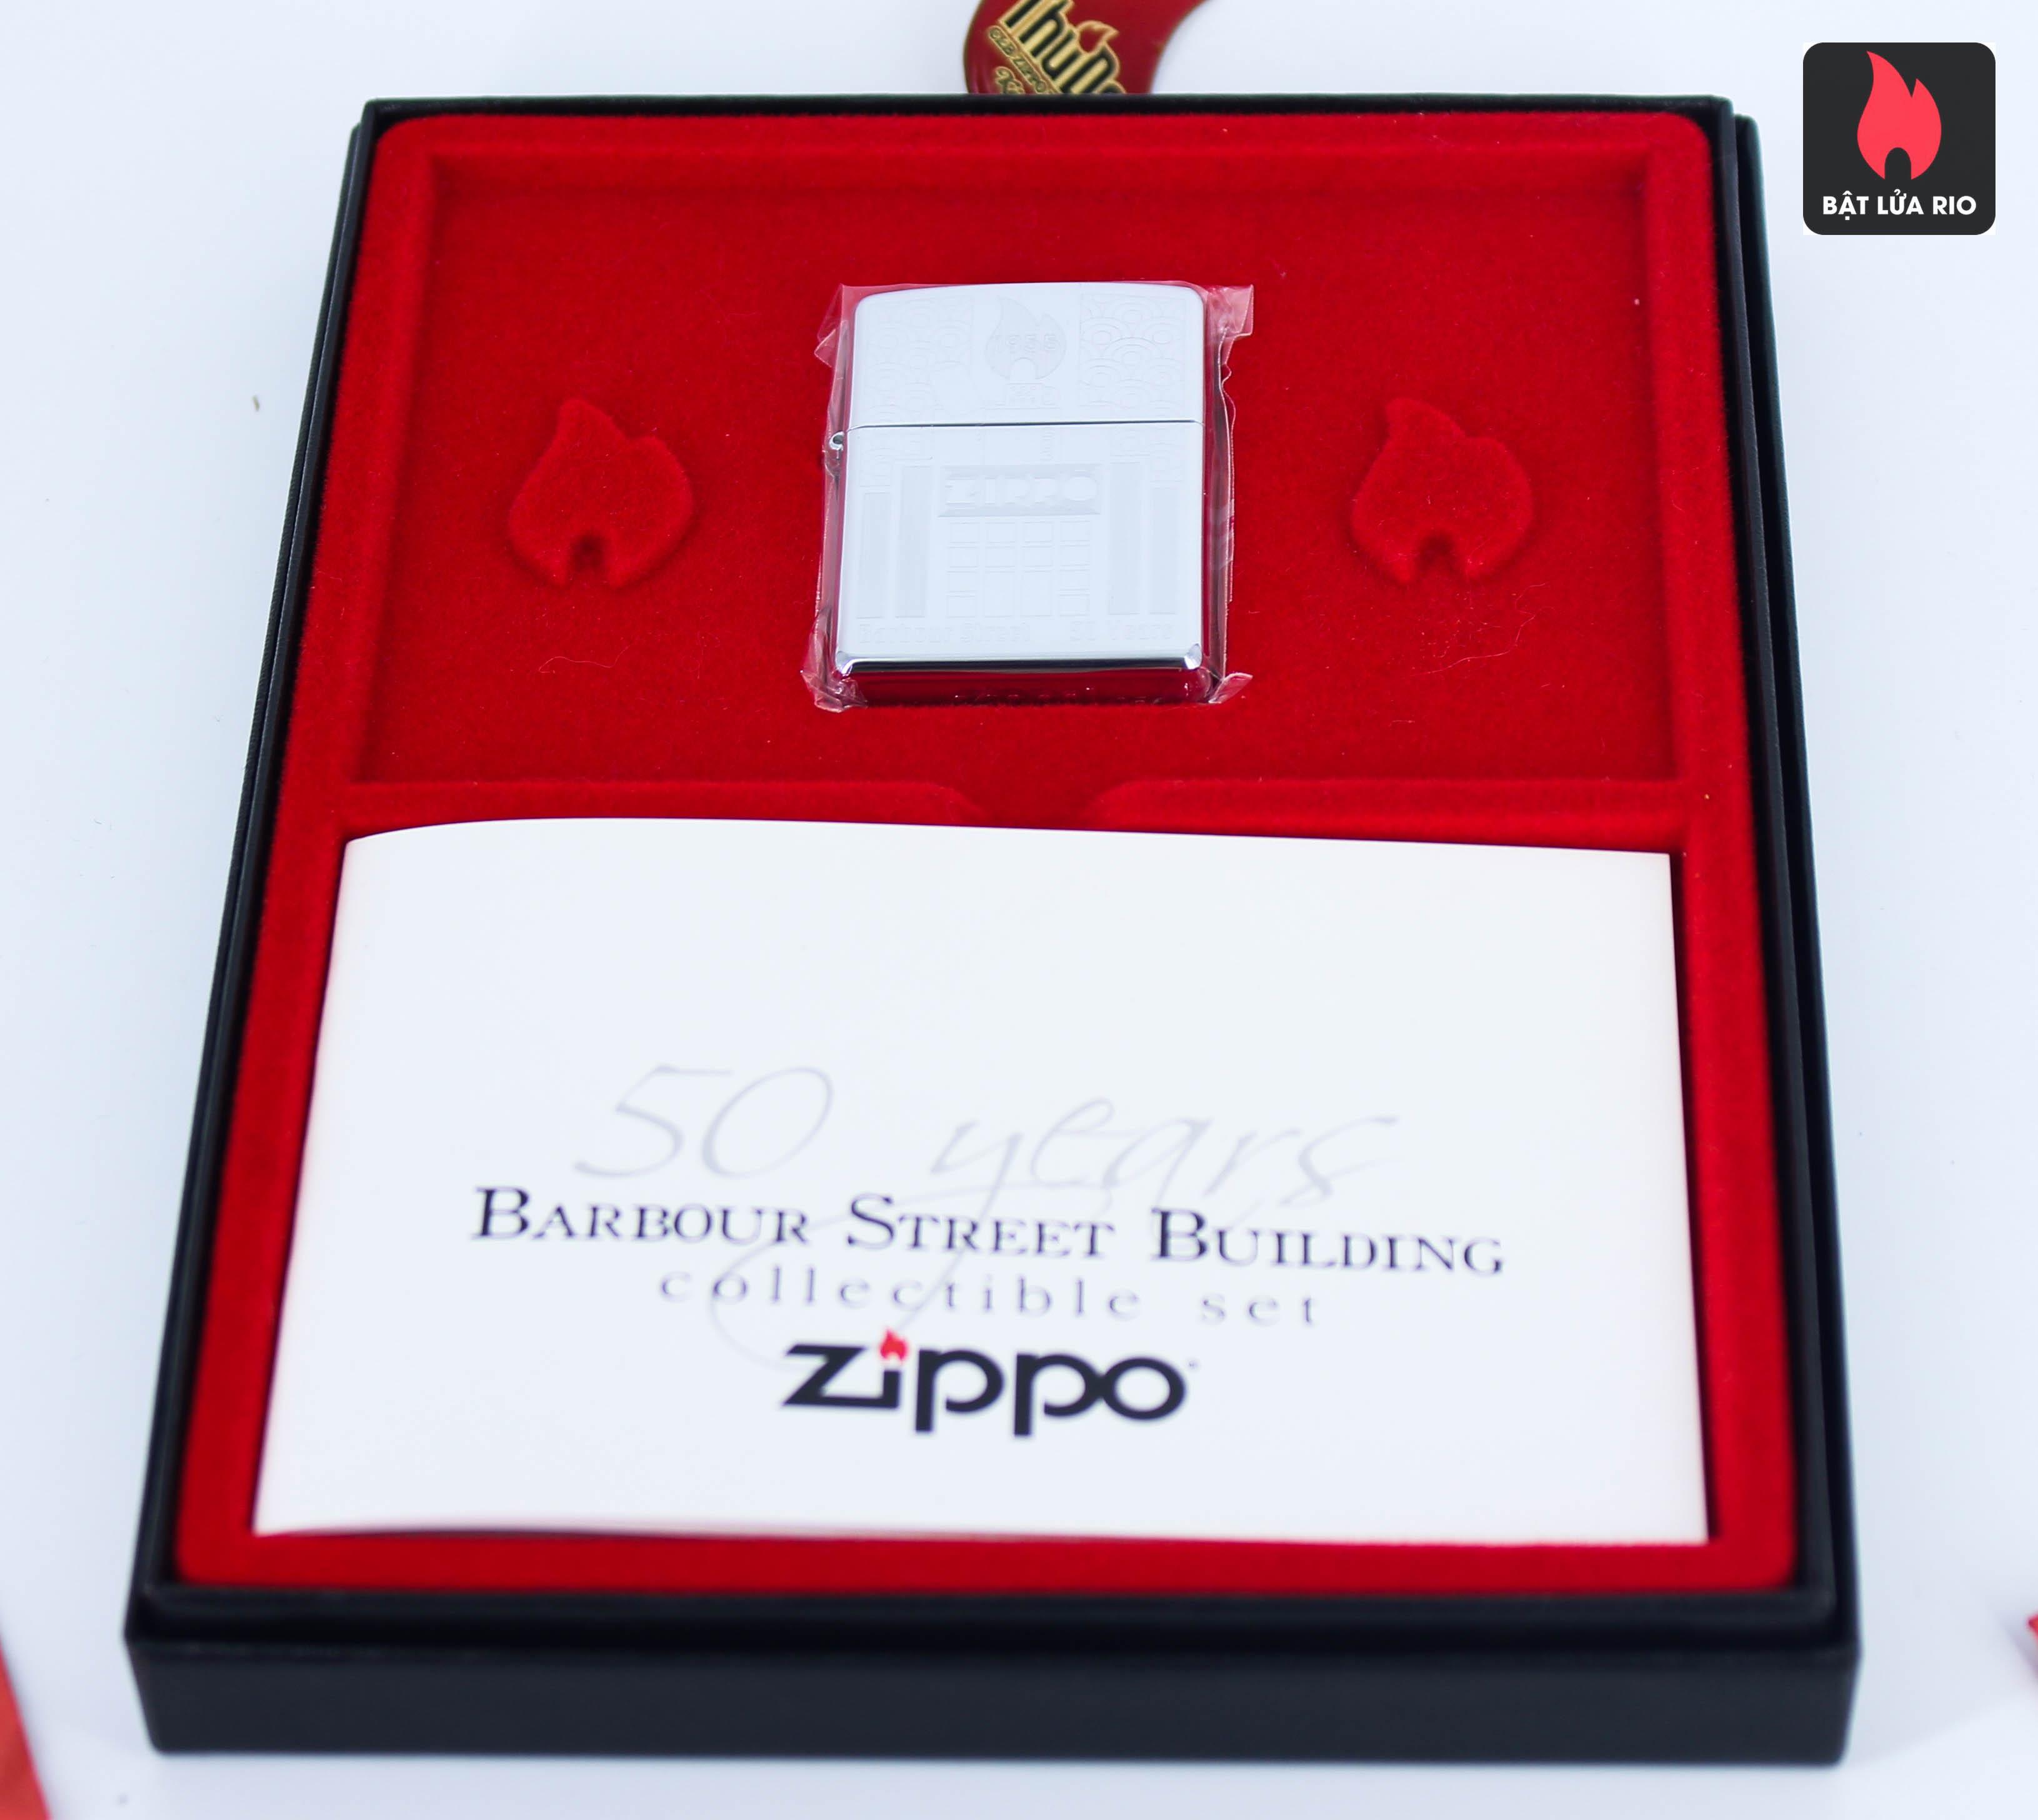 Zippo 2005 - 50 Years Barnour Street Building